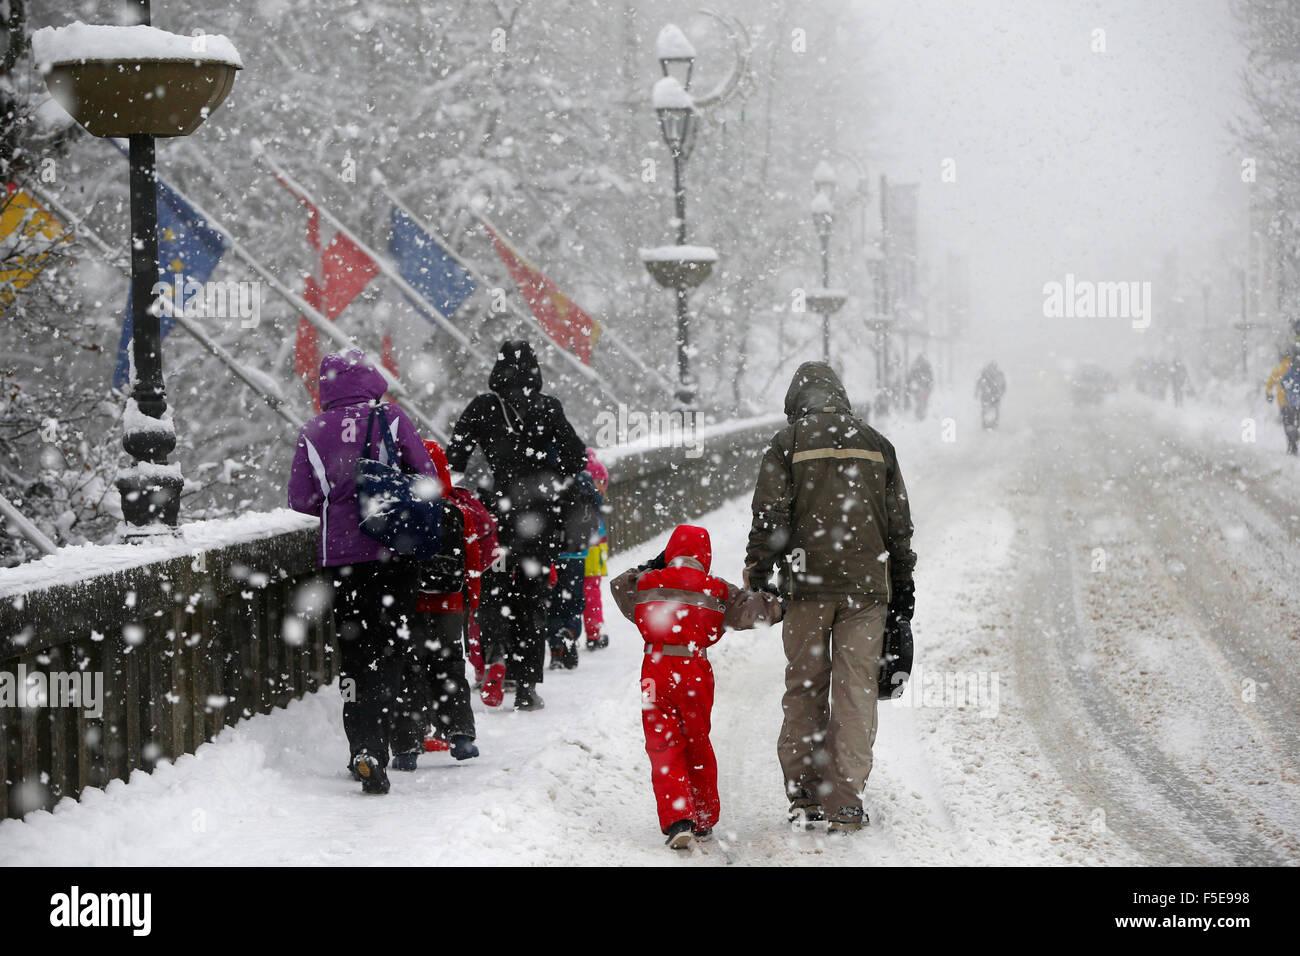 Nevicata, Saint-Gervais-les-Bains, Alta Savoia, Francia, Europa Immagini Stock